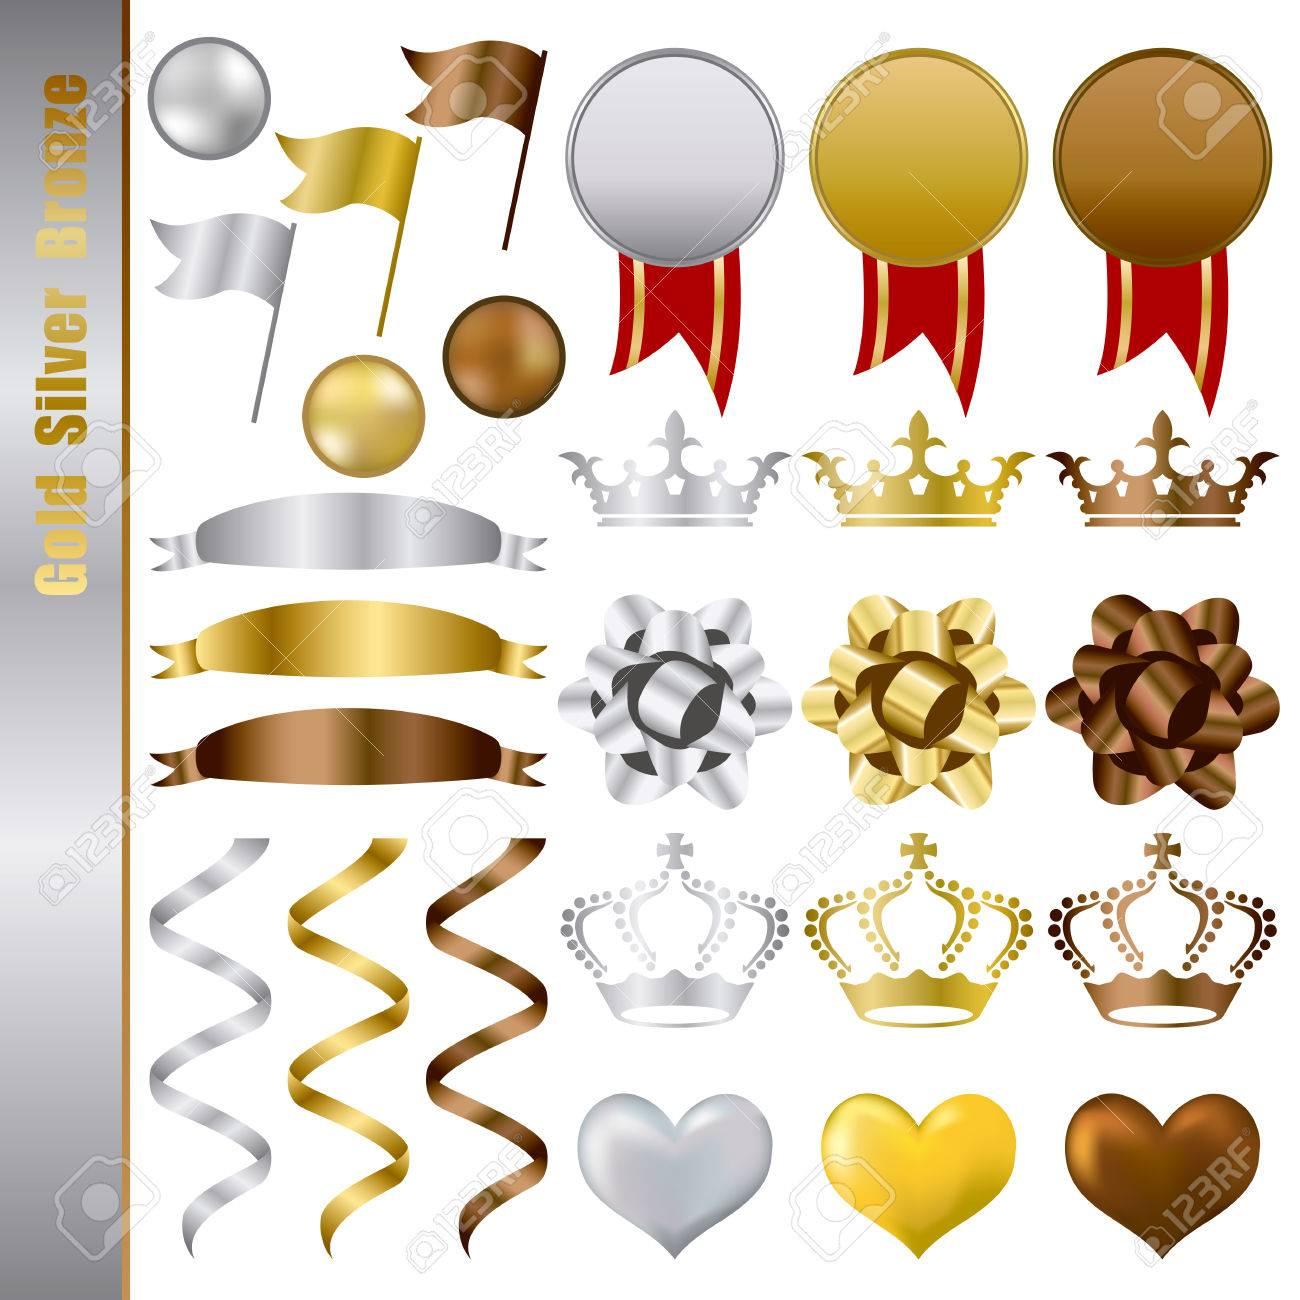 Gold Silver bronze Awards Set. Illustration Stock Vector - 8646146